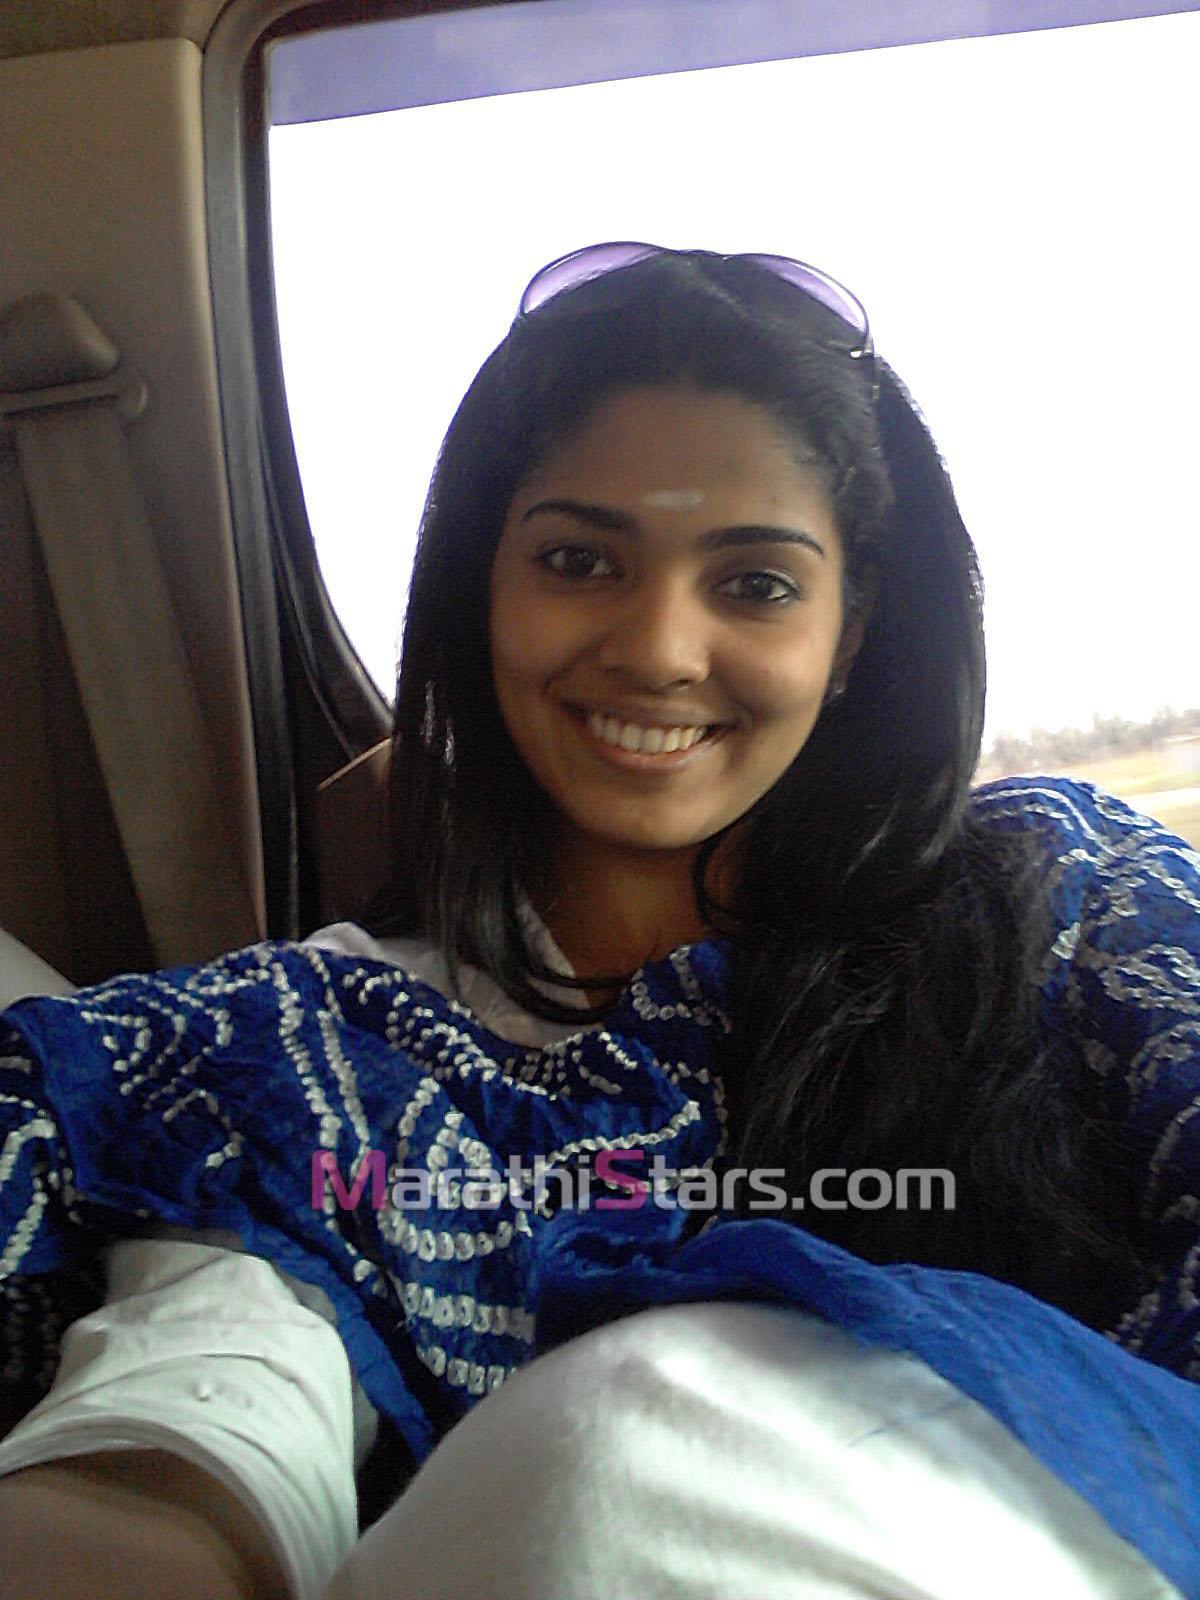 Pooja sawant marathi actress photosbiographywallpaperswikihot marathi actress pooja sawant photos thecheapjerseys Images